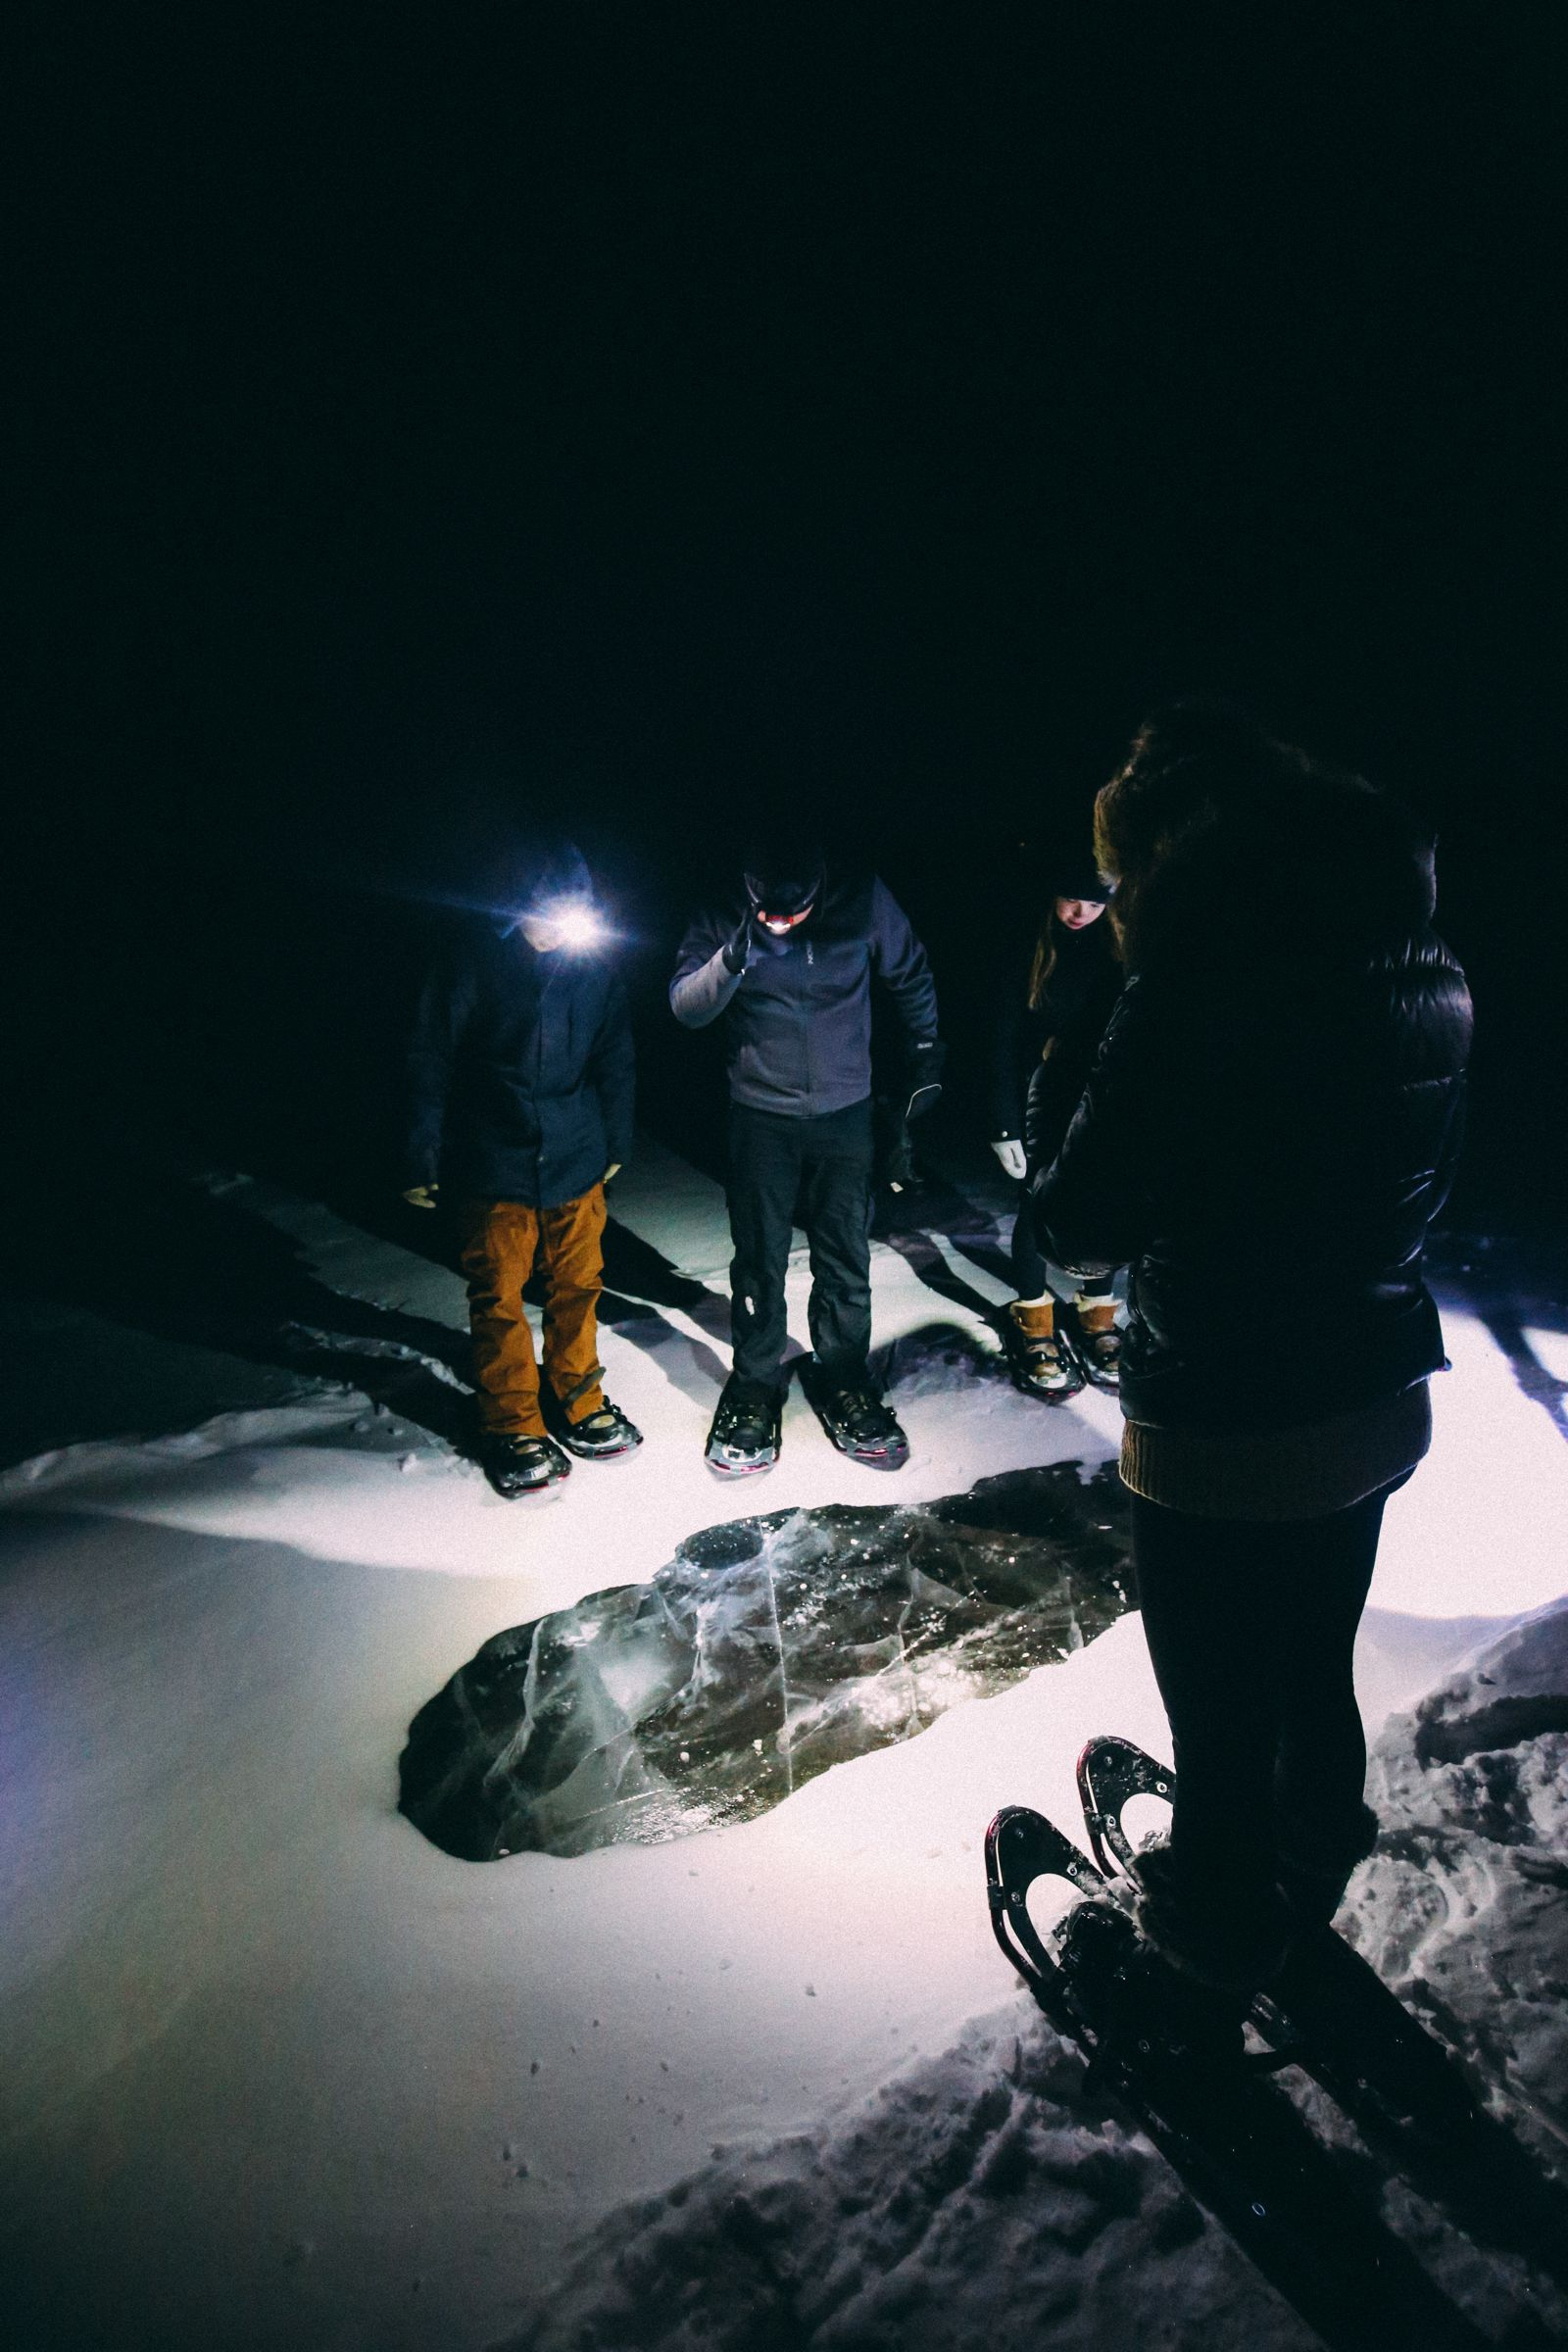 Midnight Moonlight Snowshoeing... In Edmonton, Canada (44)